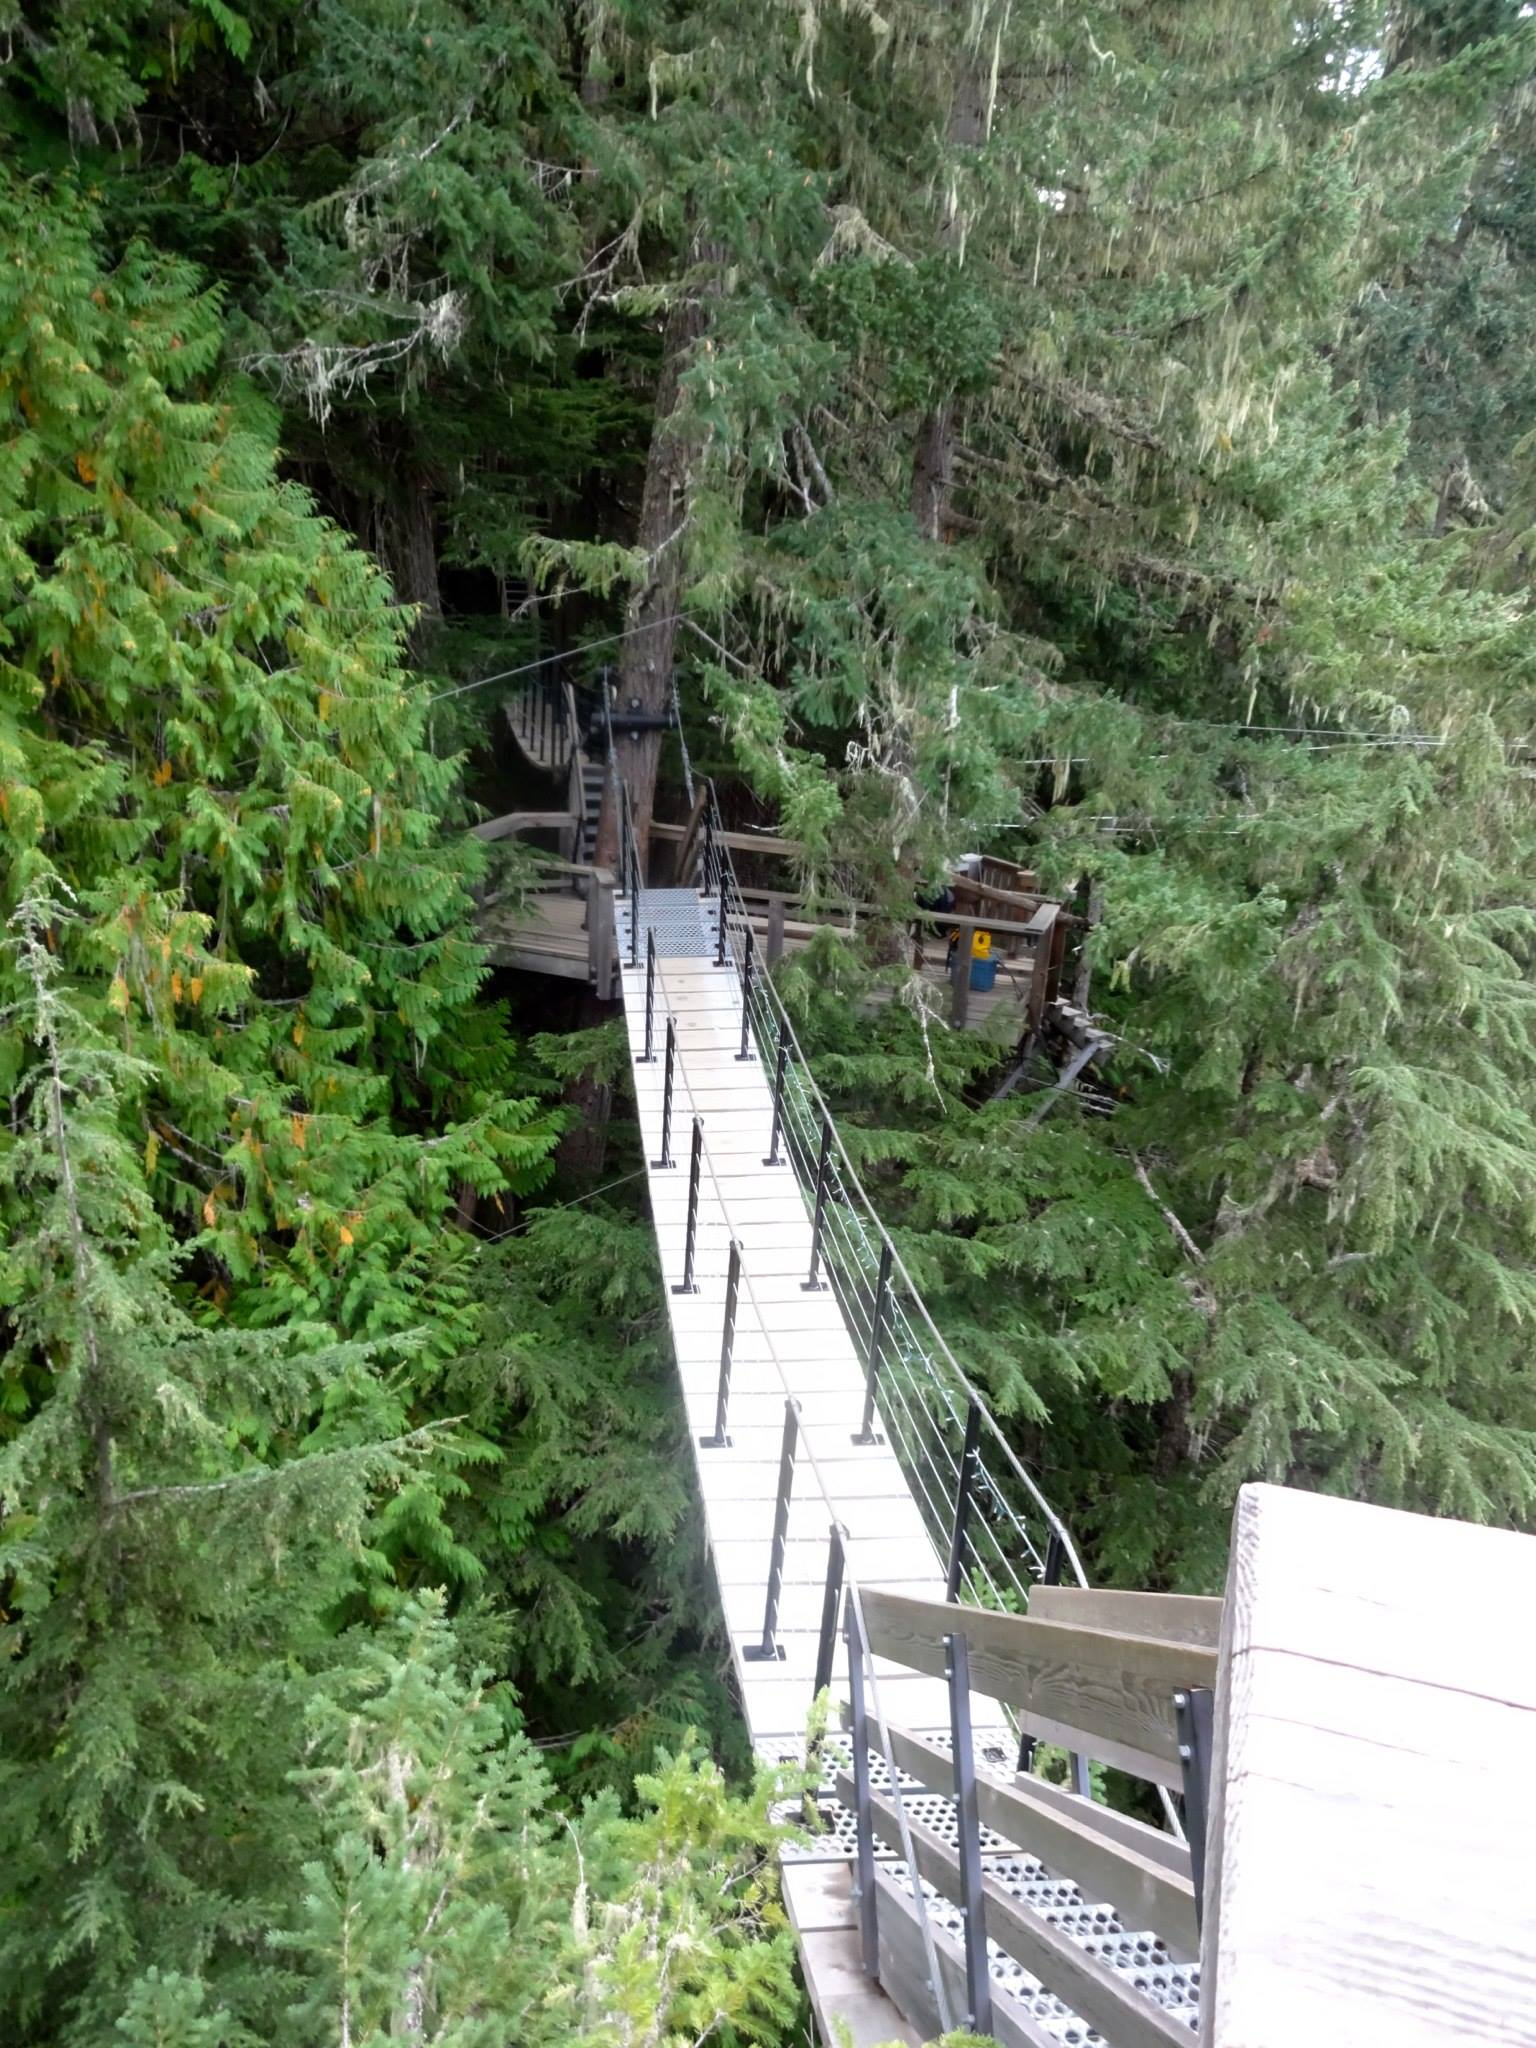 Zipline platform at Whistler Village